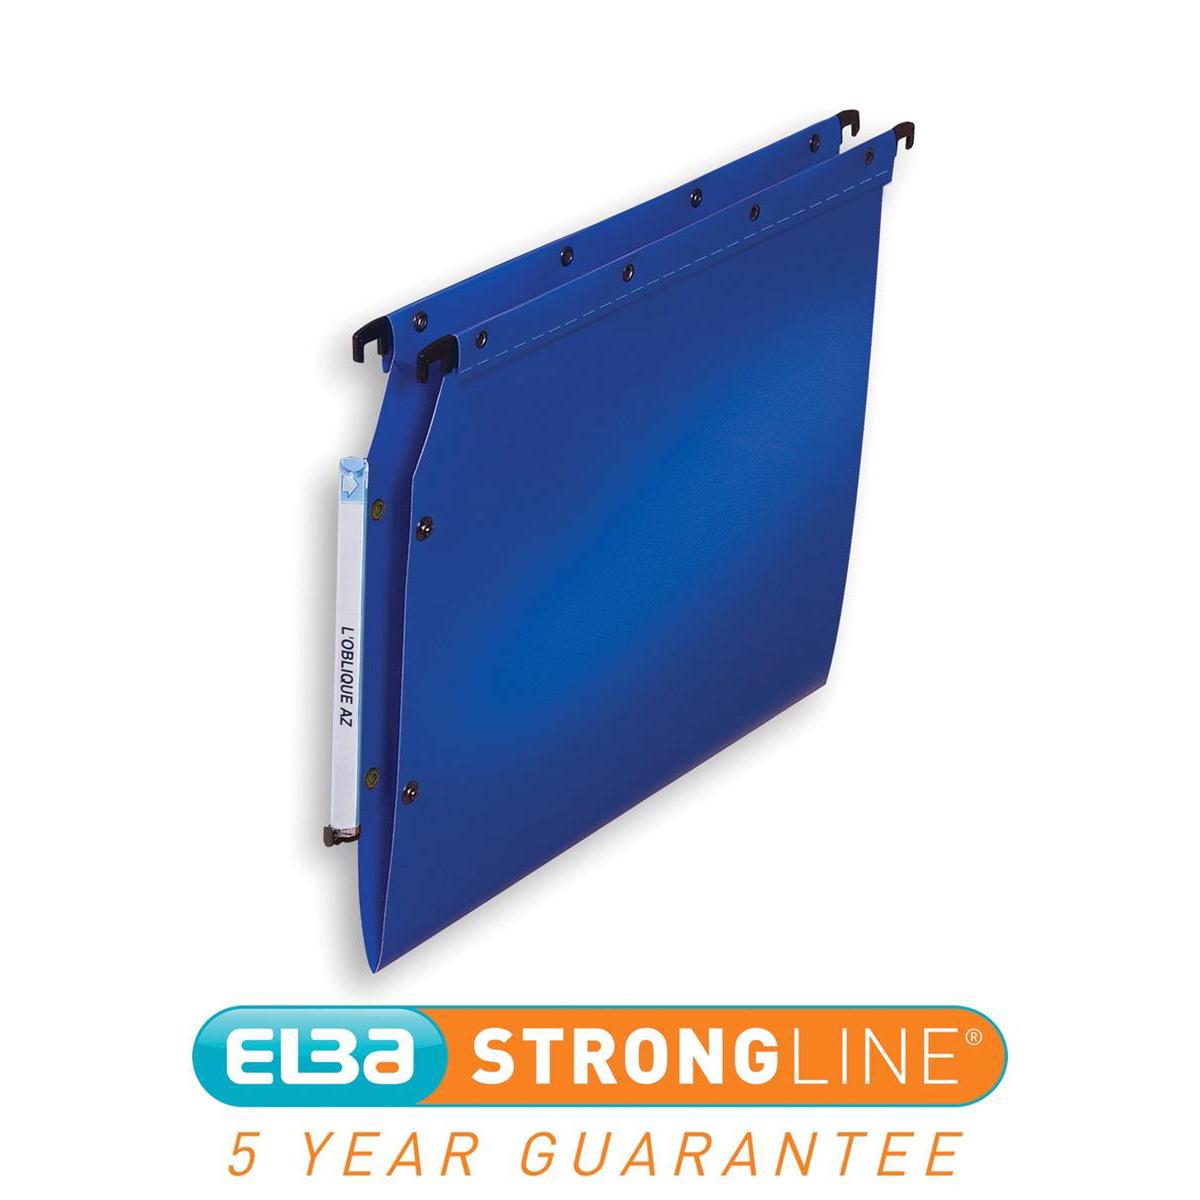 Elba Ultimate Polypro Linking Lateral File Polypropylene 15mm V-base A4 Blue Ref 100330583 Pack 25